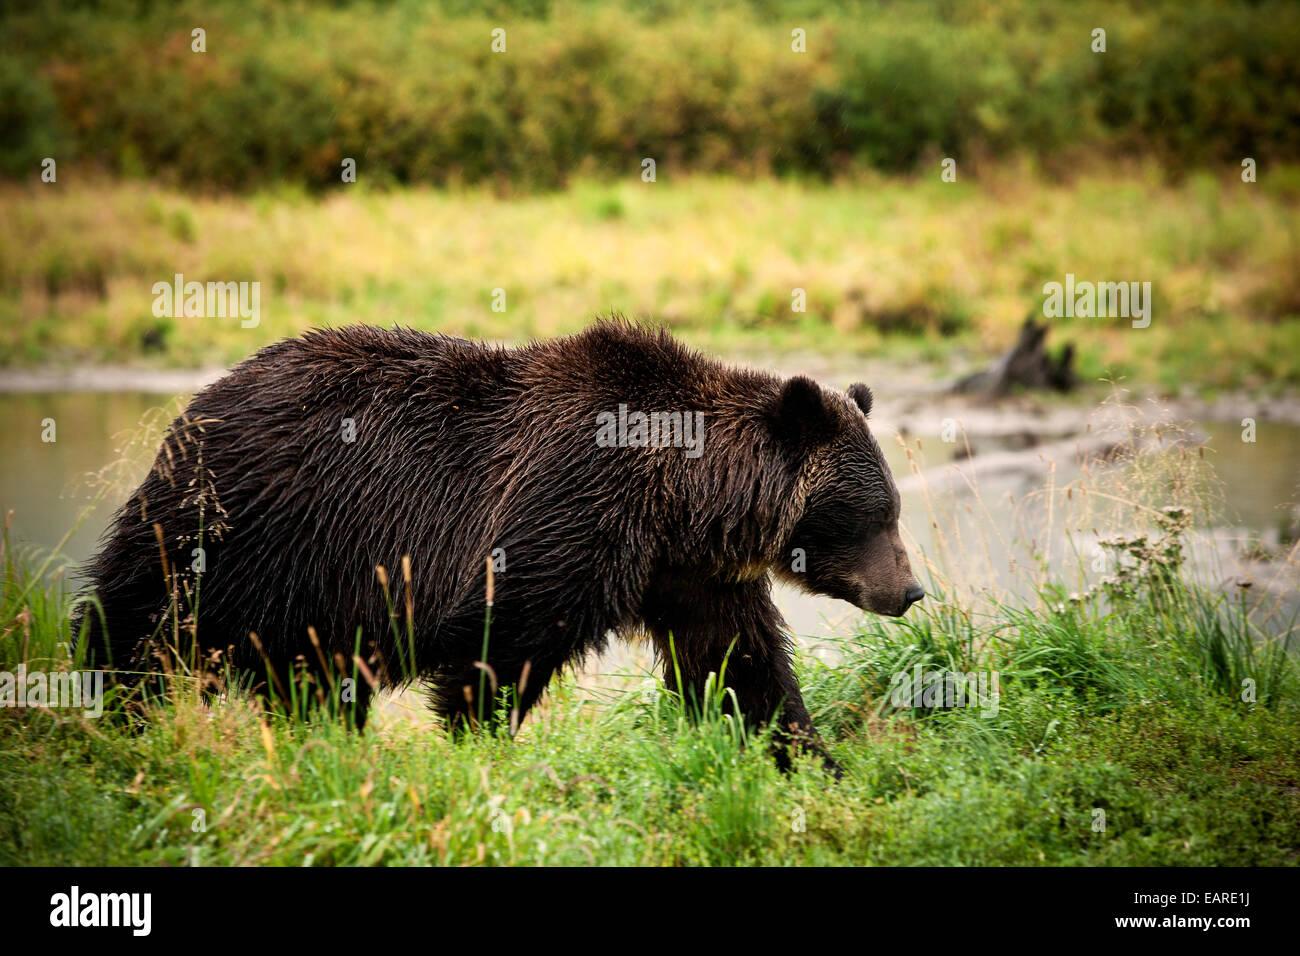 Grizzly Bear (Ursus arctos horribilis), Valdez, Alaska, United States Stock Photo